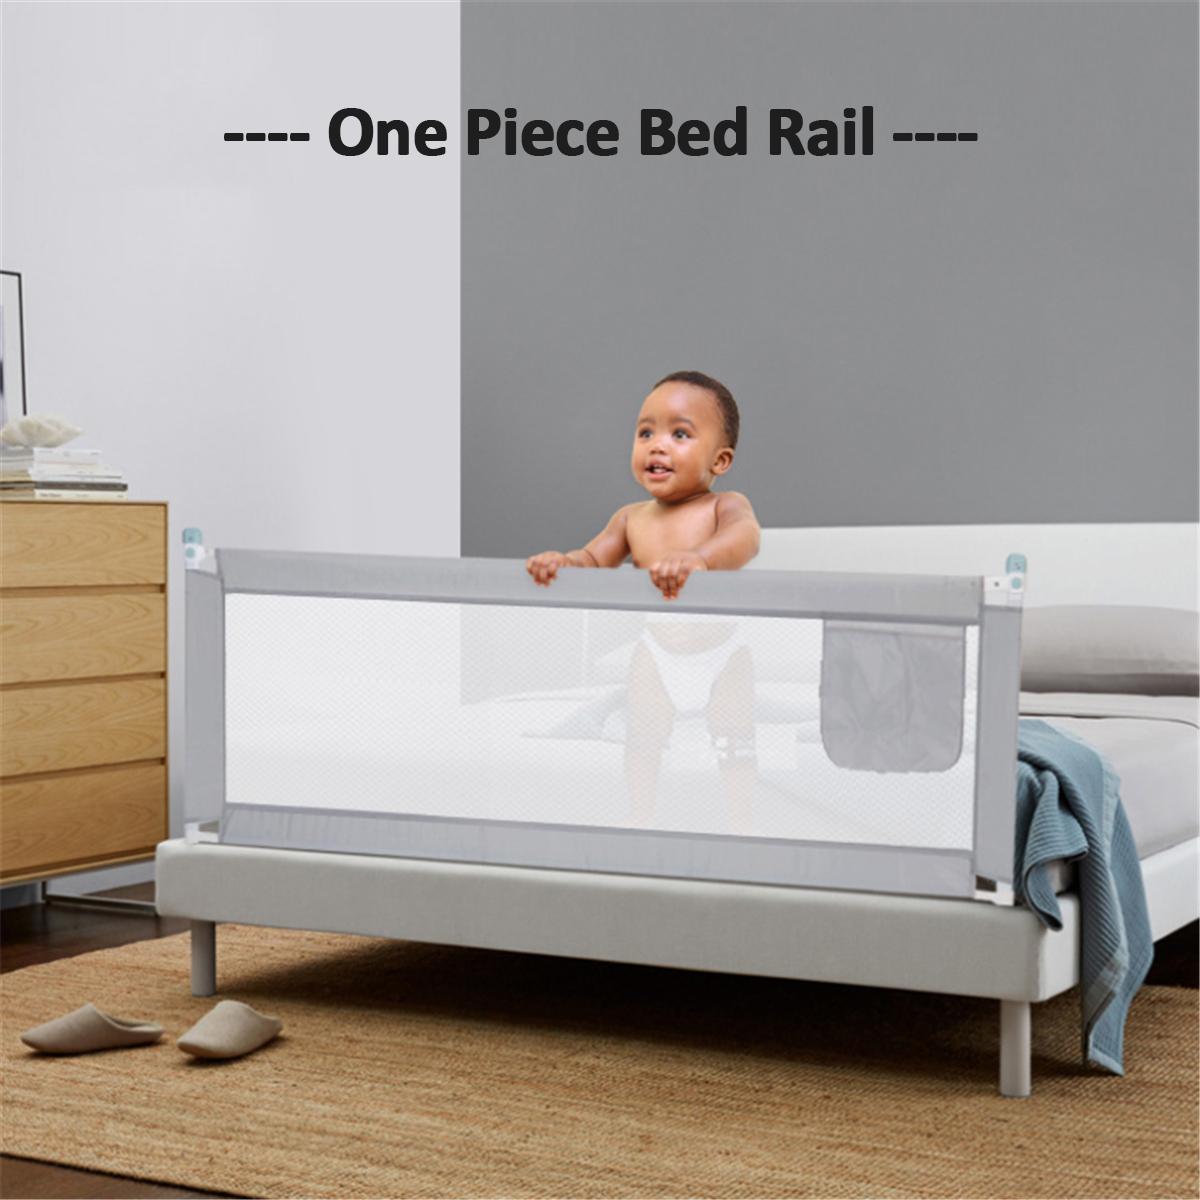 2M Kid Child Bedguard Toddler Safety Bed Rail Guard Rail Folding Sleep 150*80cm